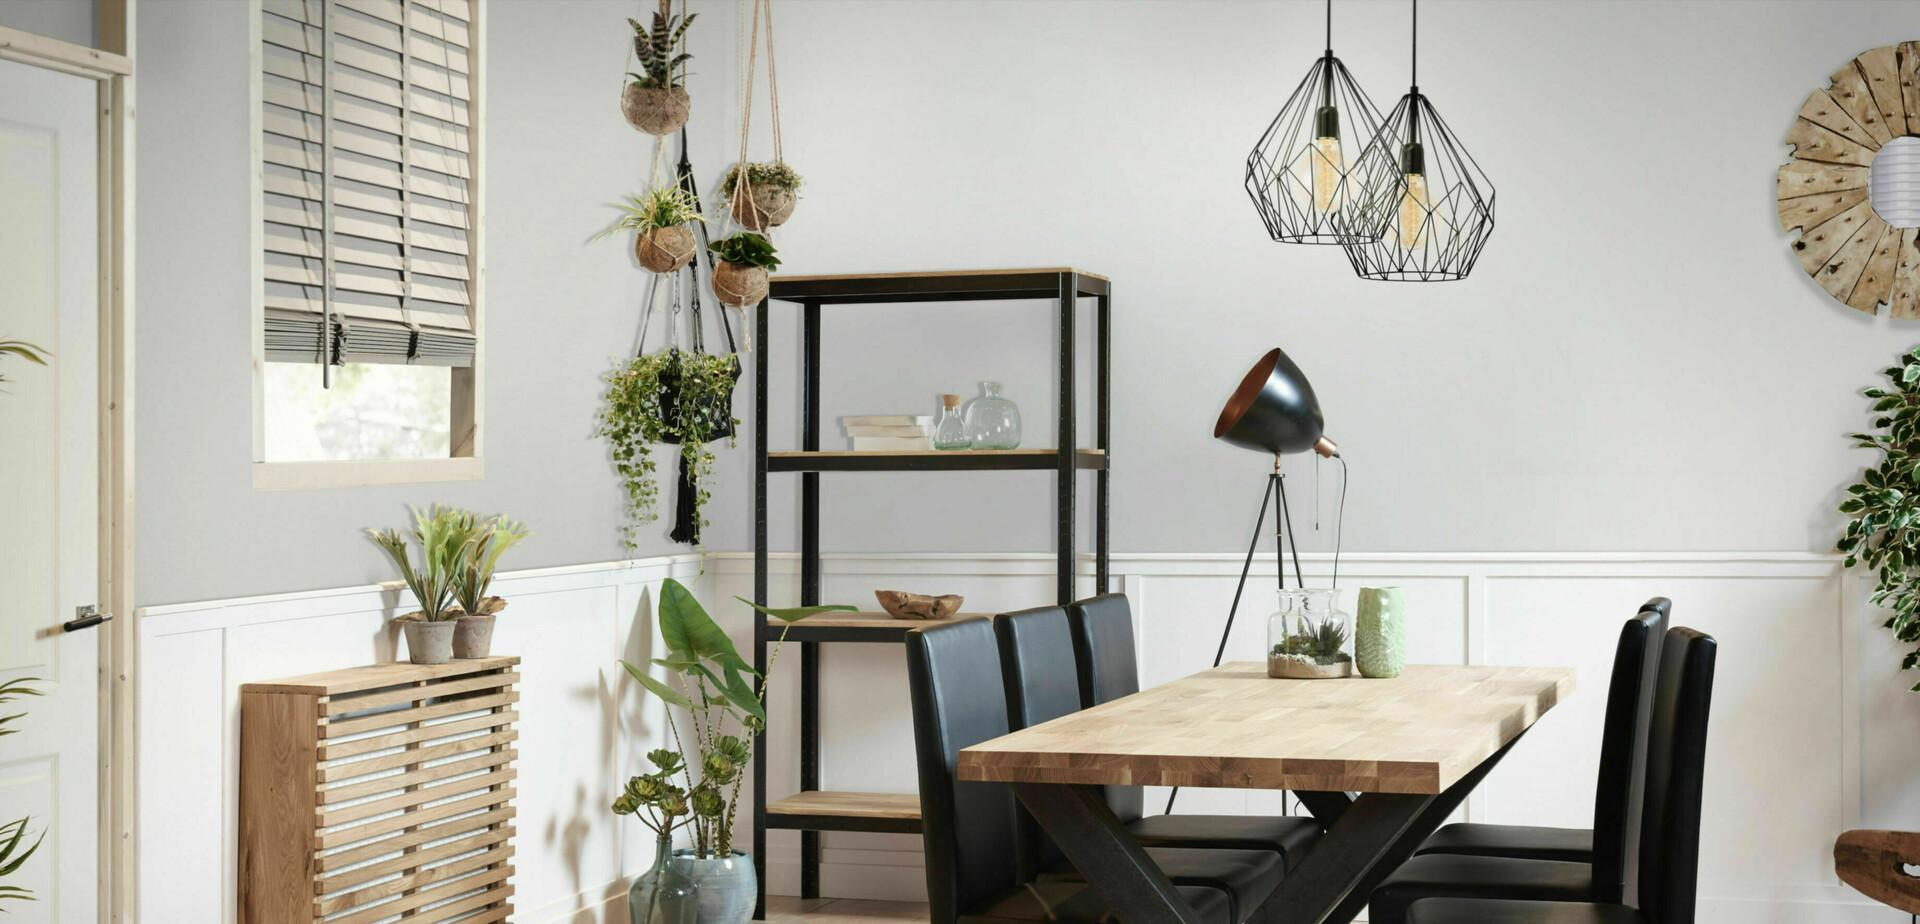 https://vdm-prd01.praxiscdn.nl/vdm/media/cover/preview/26570/extra_big_woonkamer-meubels-2017-10-09_at_09.15.47.jpg